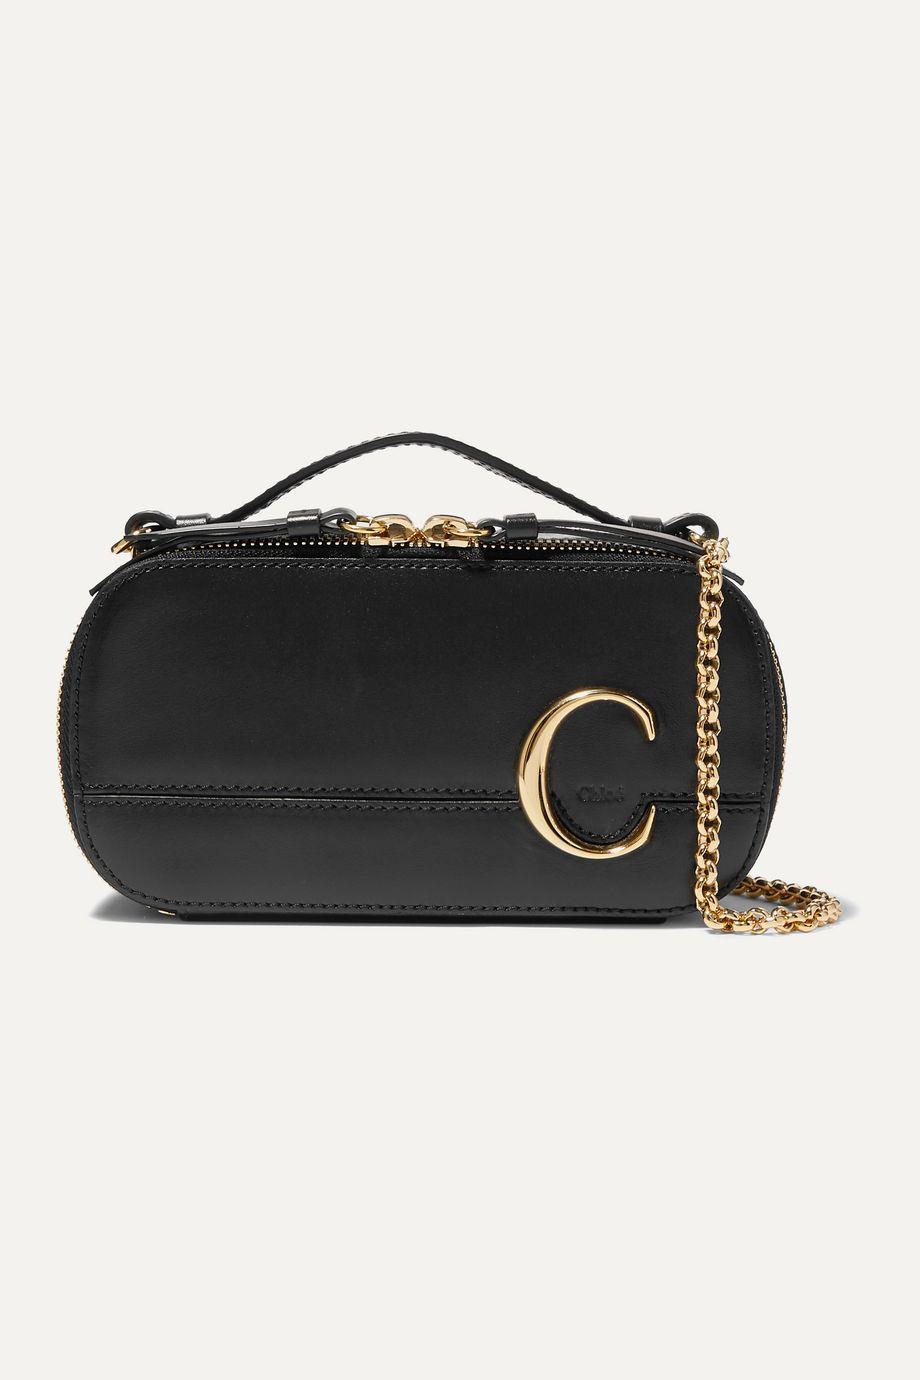 Chloé Chloé C leather shoulder bag